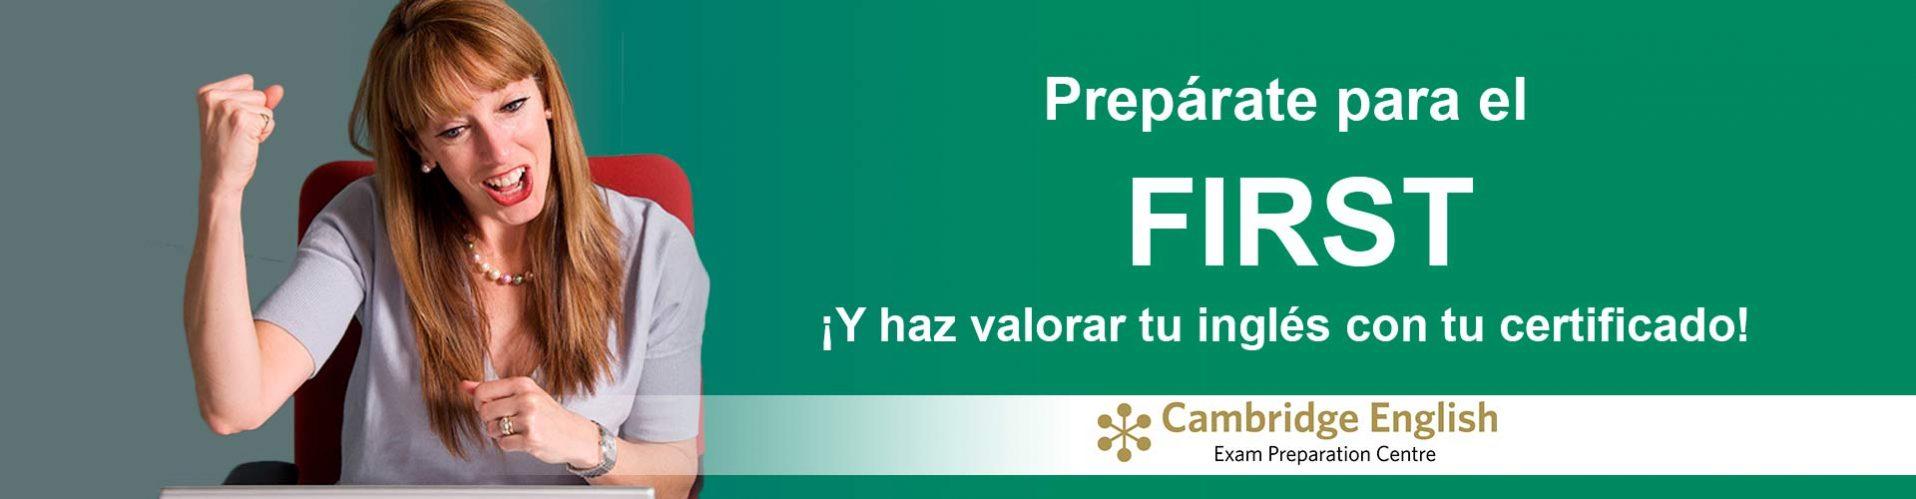 Preparación examen First - Inscripción abierta